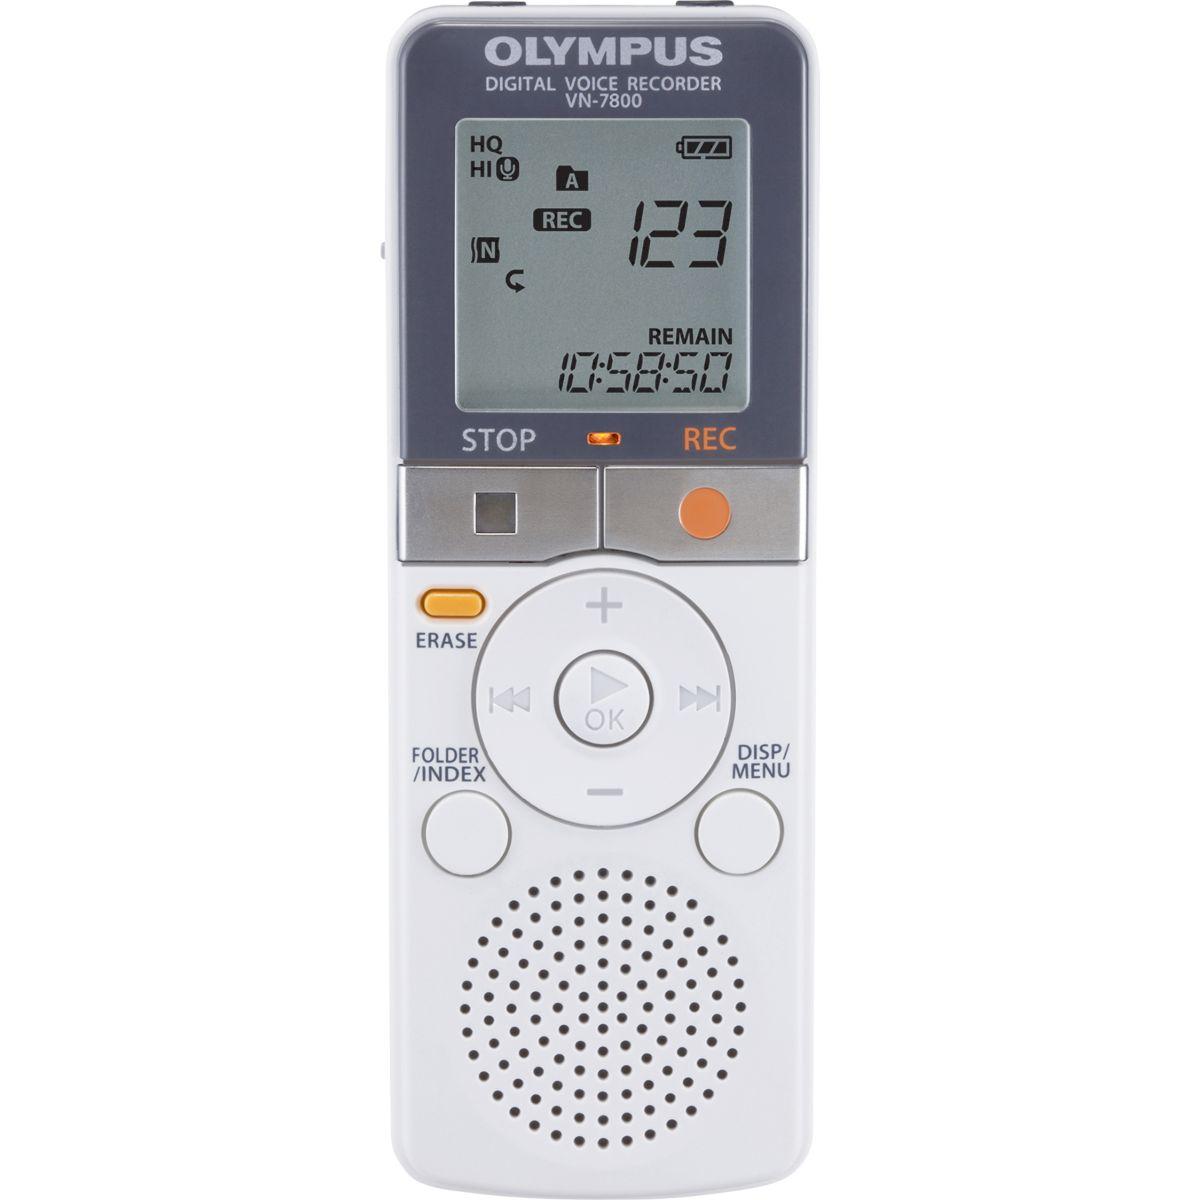 Dictaphone olympus vn-7800 - 15% de remise immédiate avec le code : multi15 (photo)